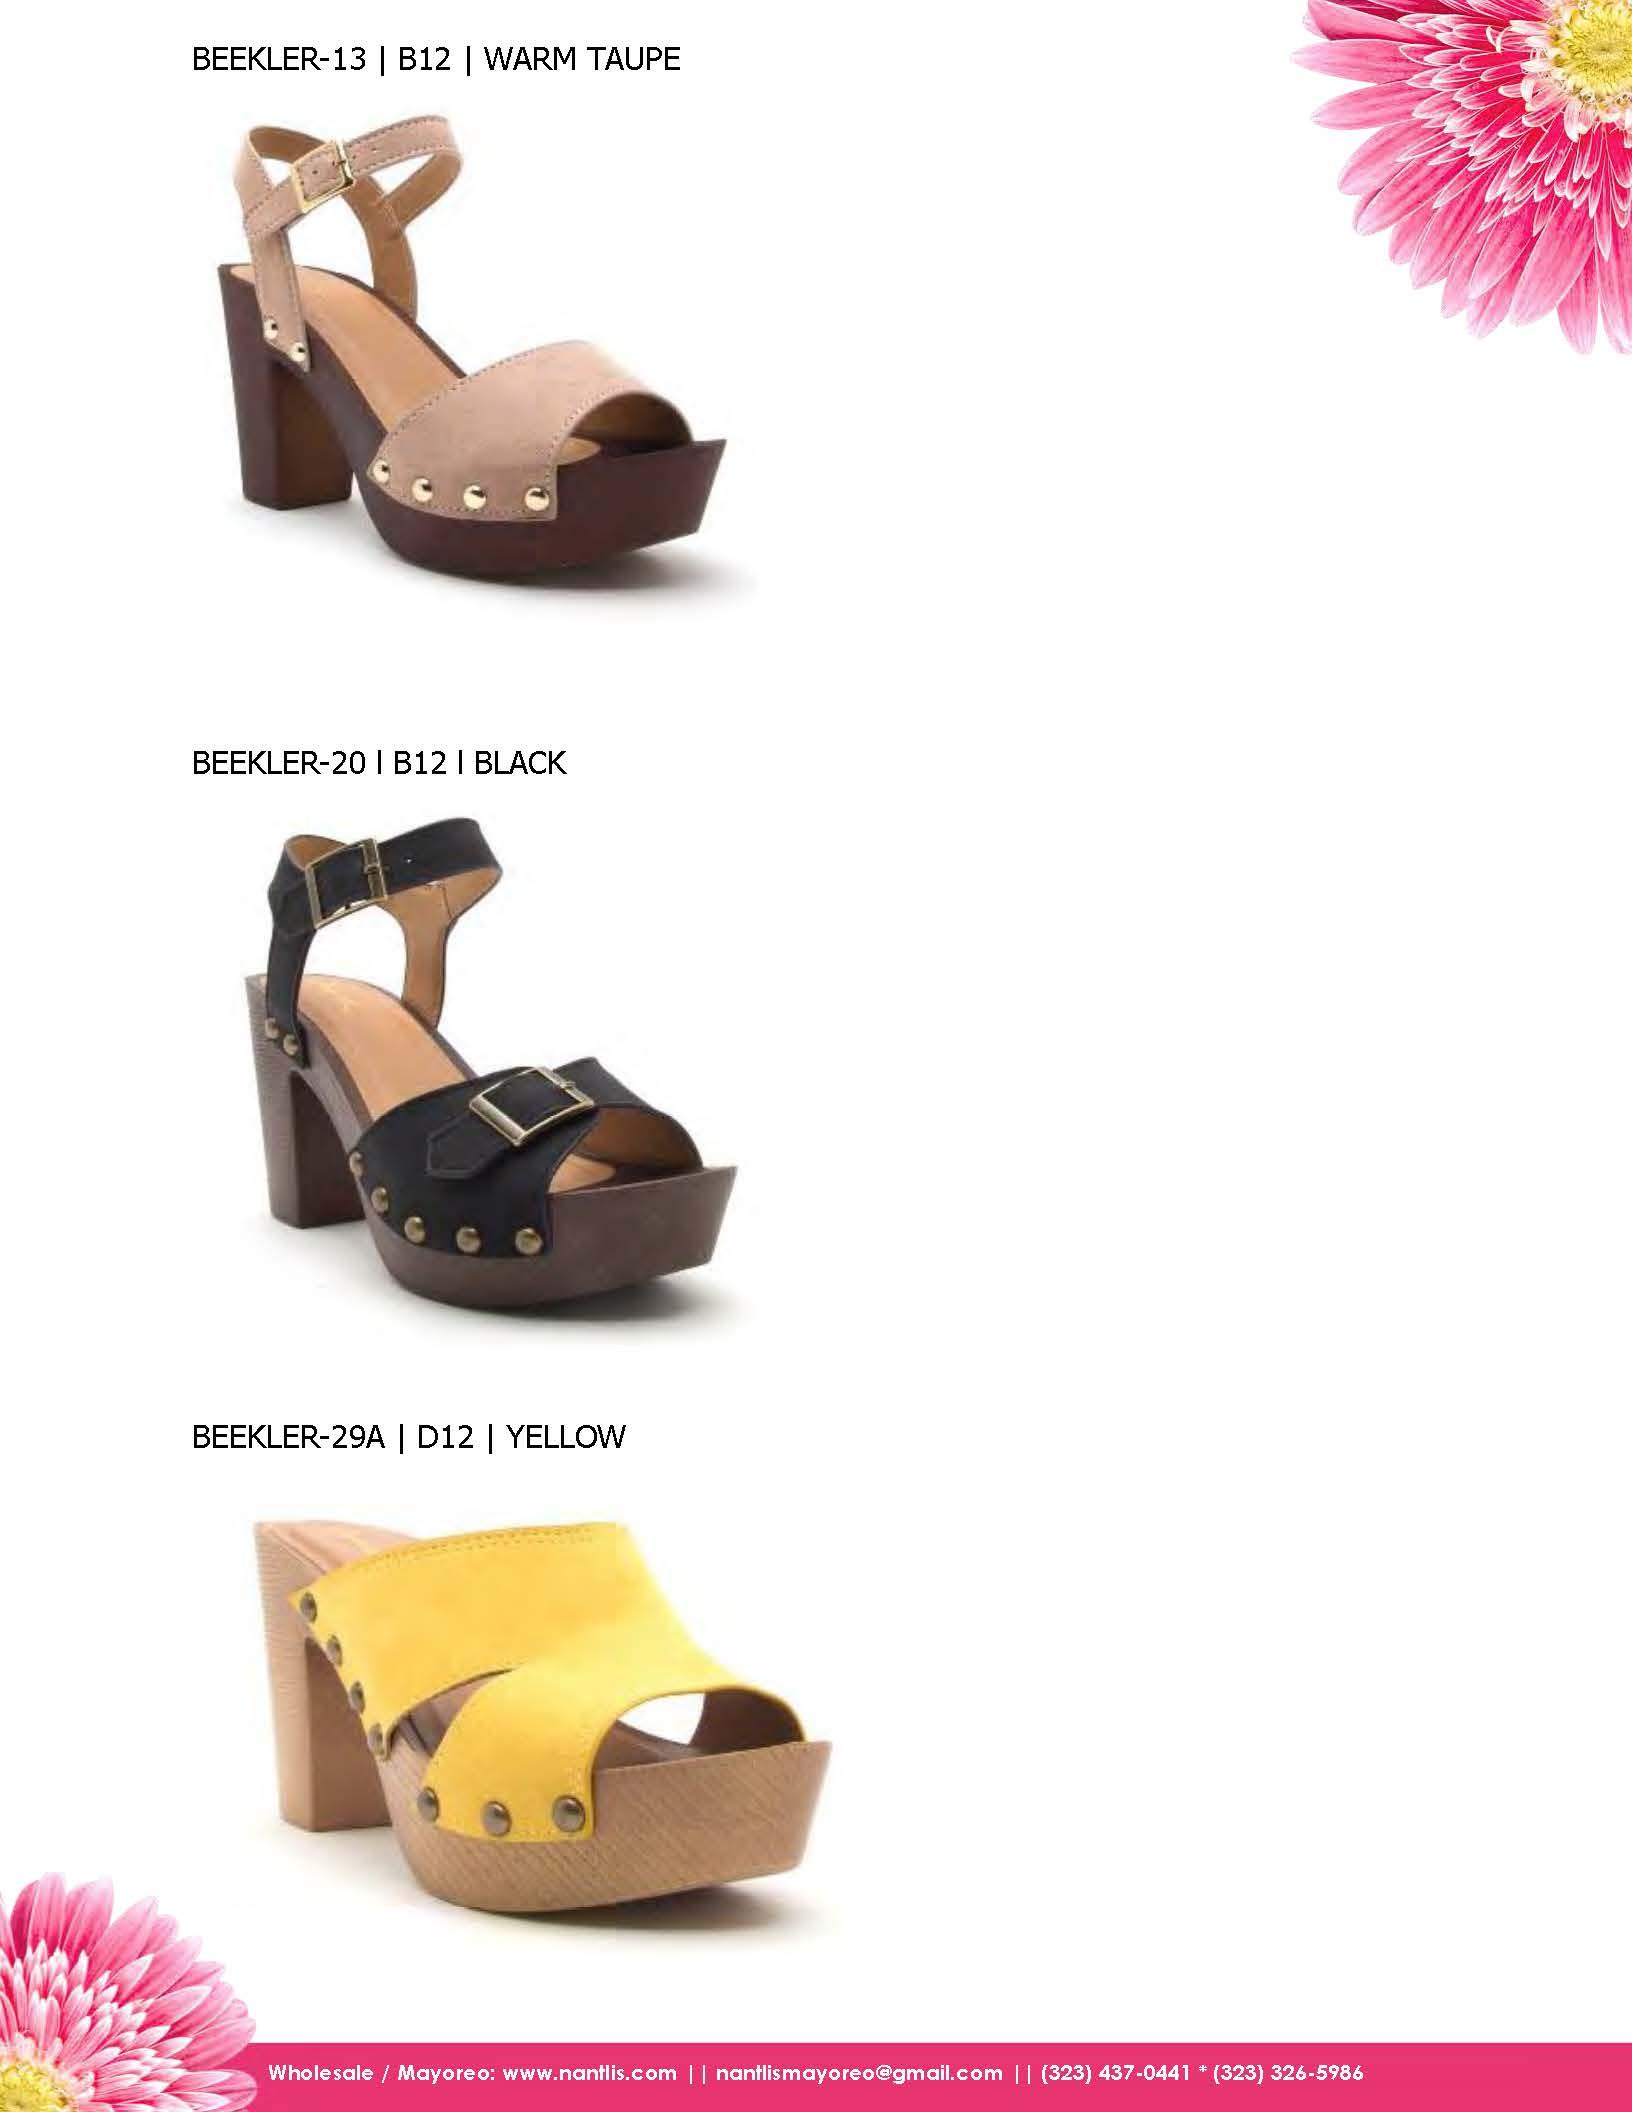 Nantlis Vol QU43 Zapatos para mujer mayoreo Wholesale shoes for women_Page_05